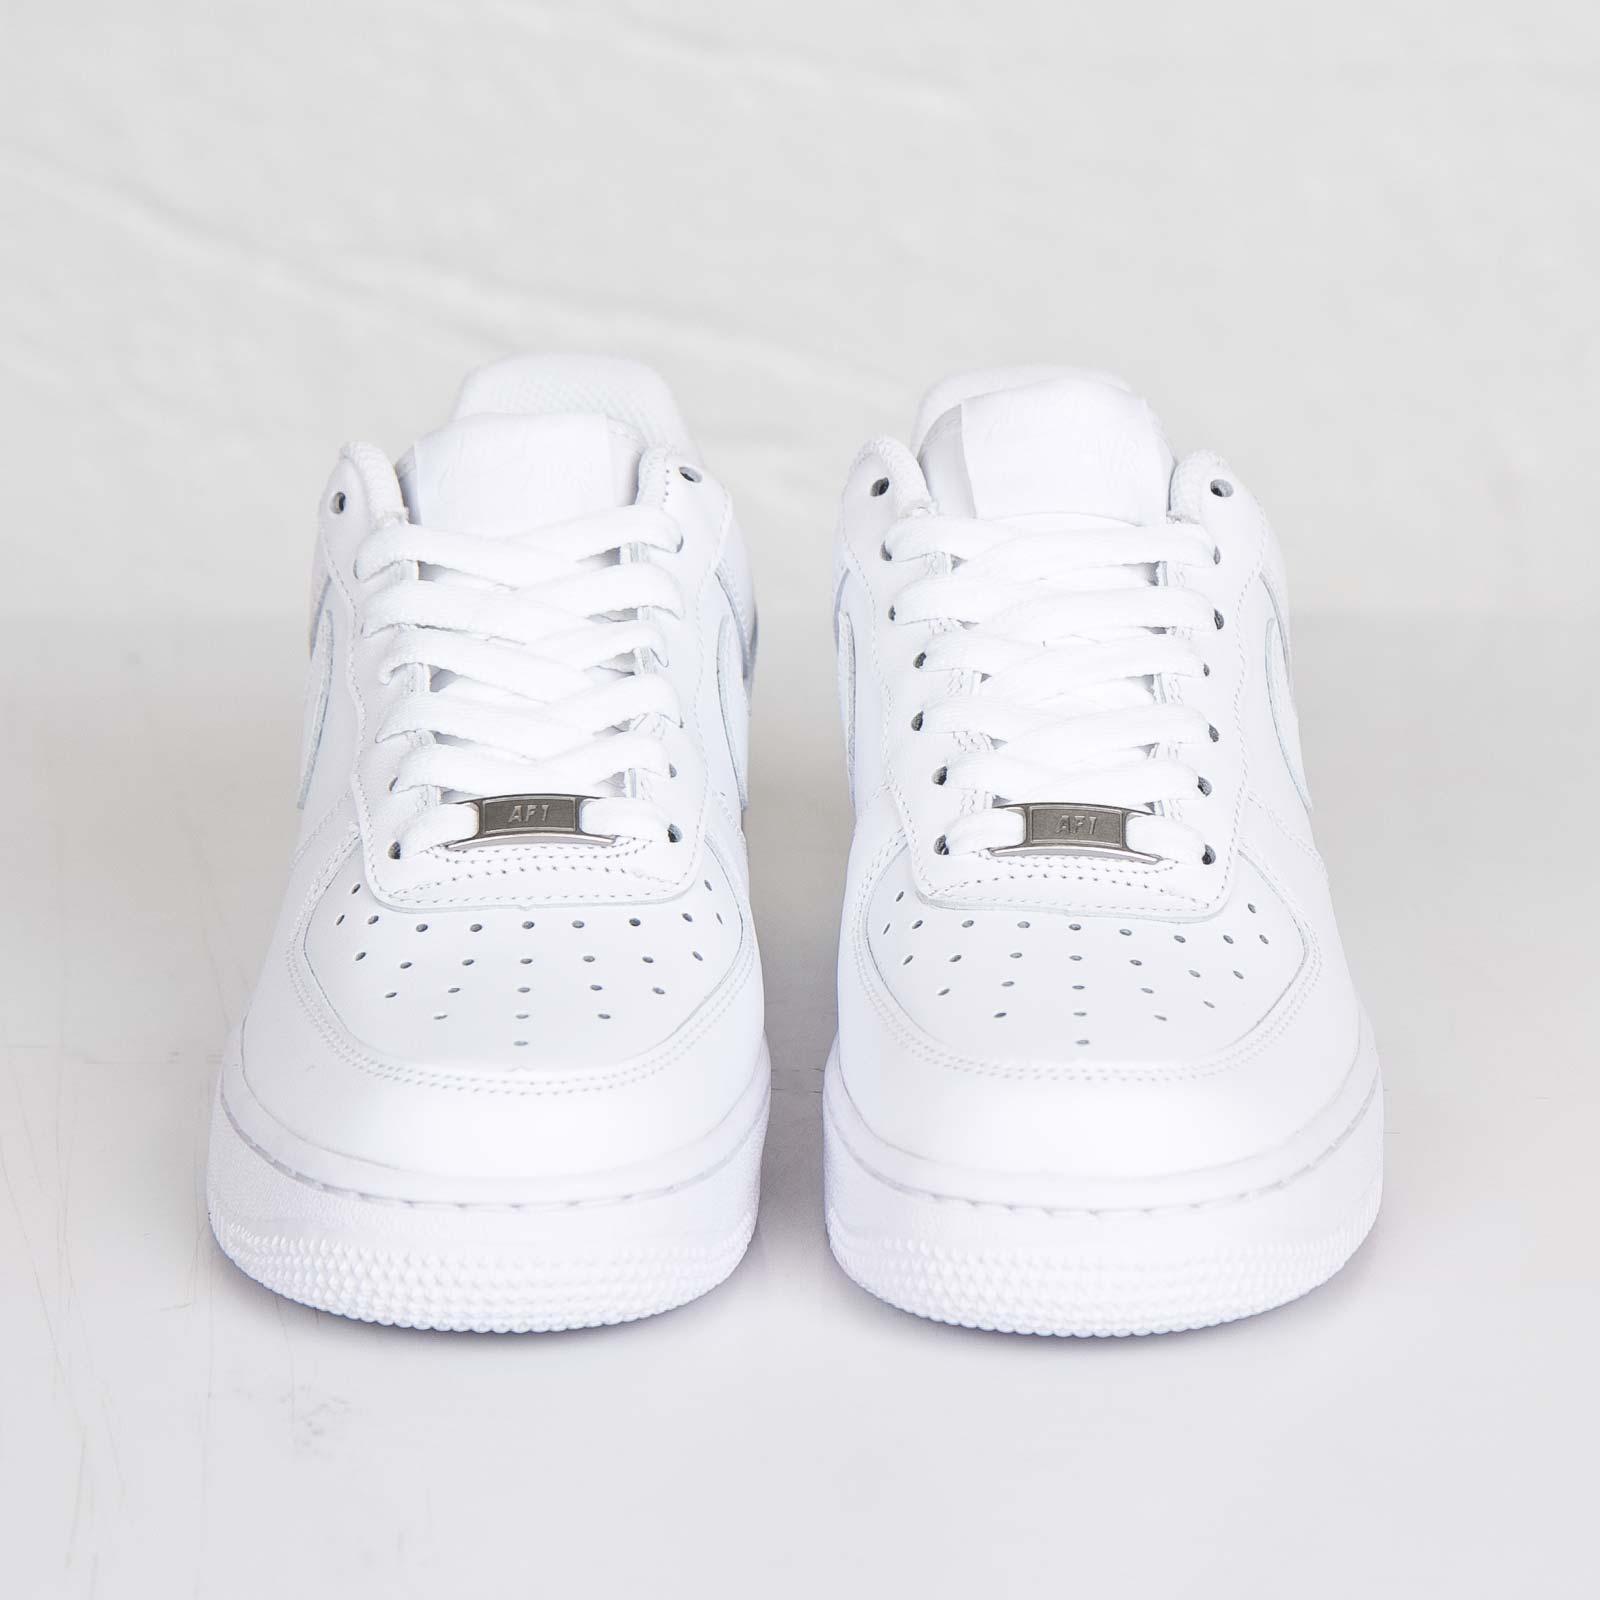 designer fashion cf37b 39750 ... Nike Wmns Air Force 1 07 ...